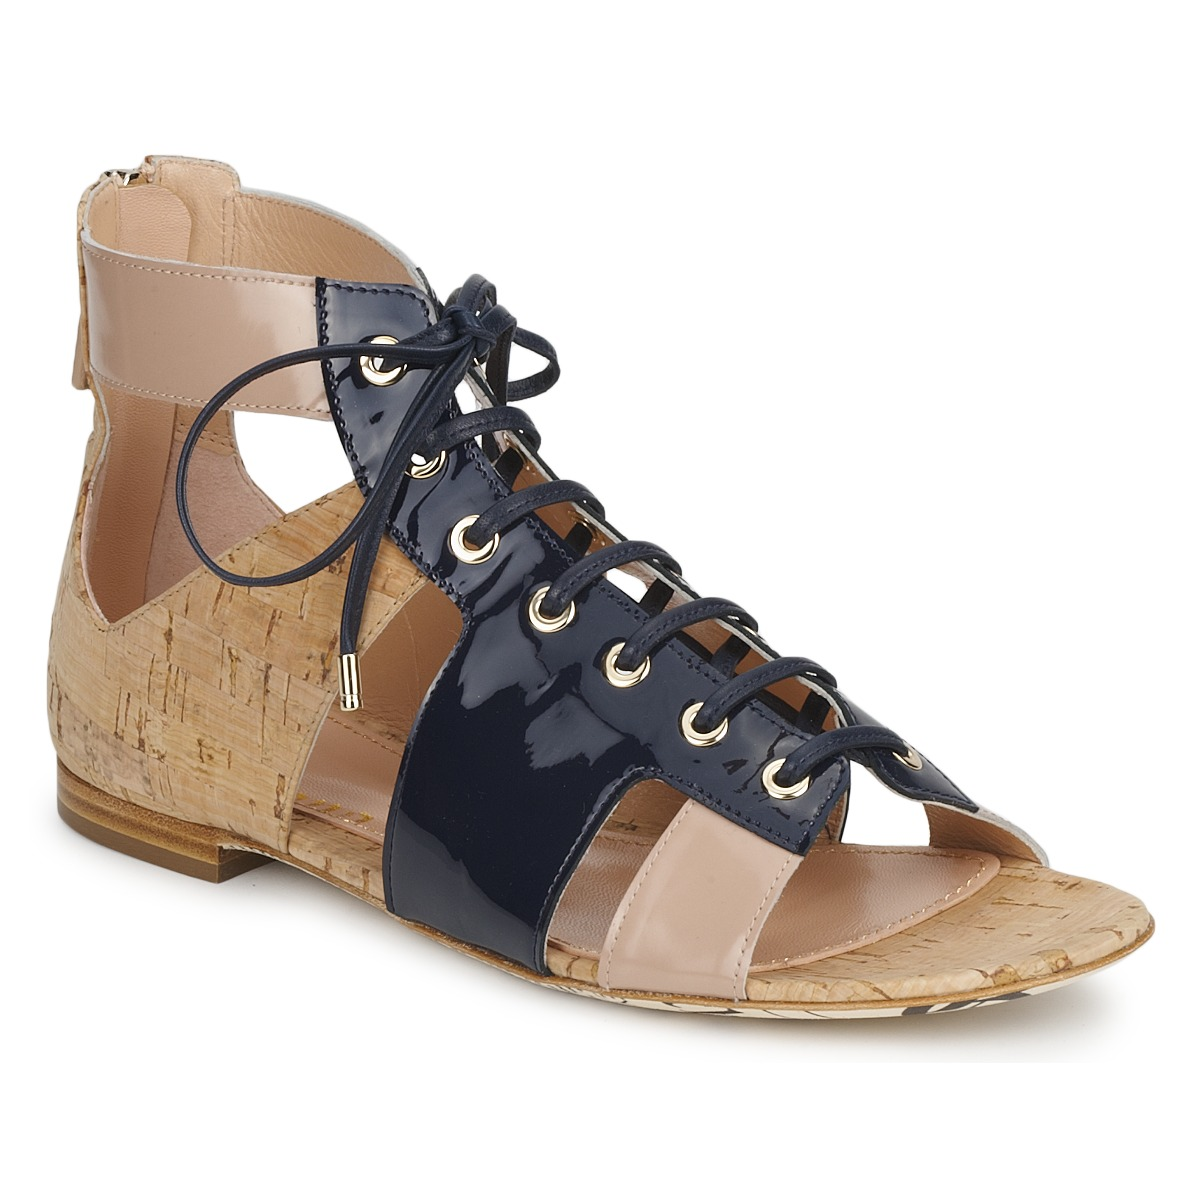 Sandale John Galliano AN6379 Bleu /Beige / Rose